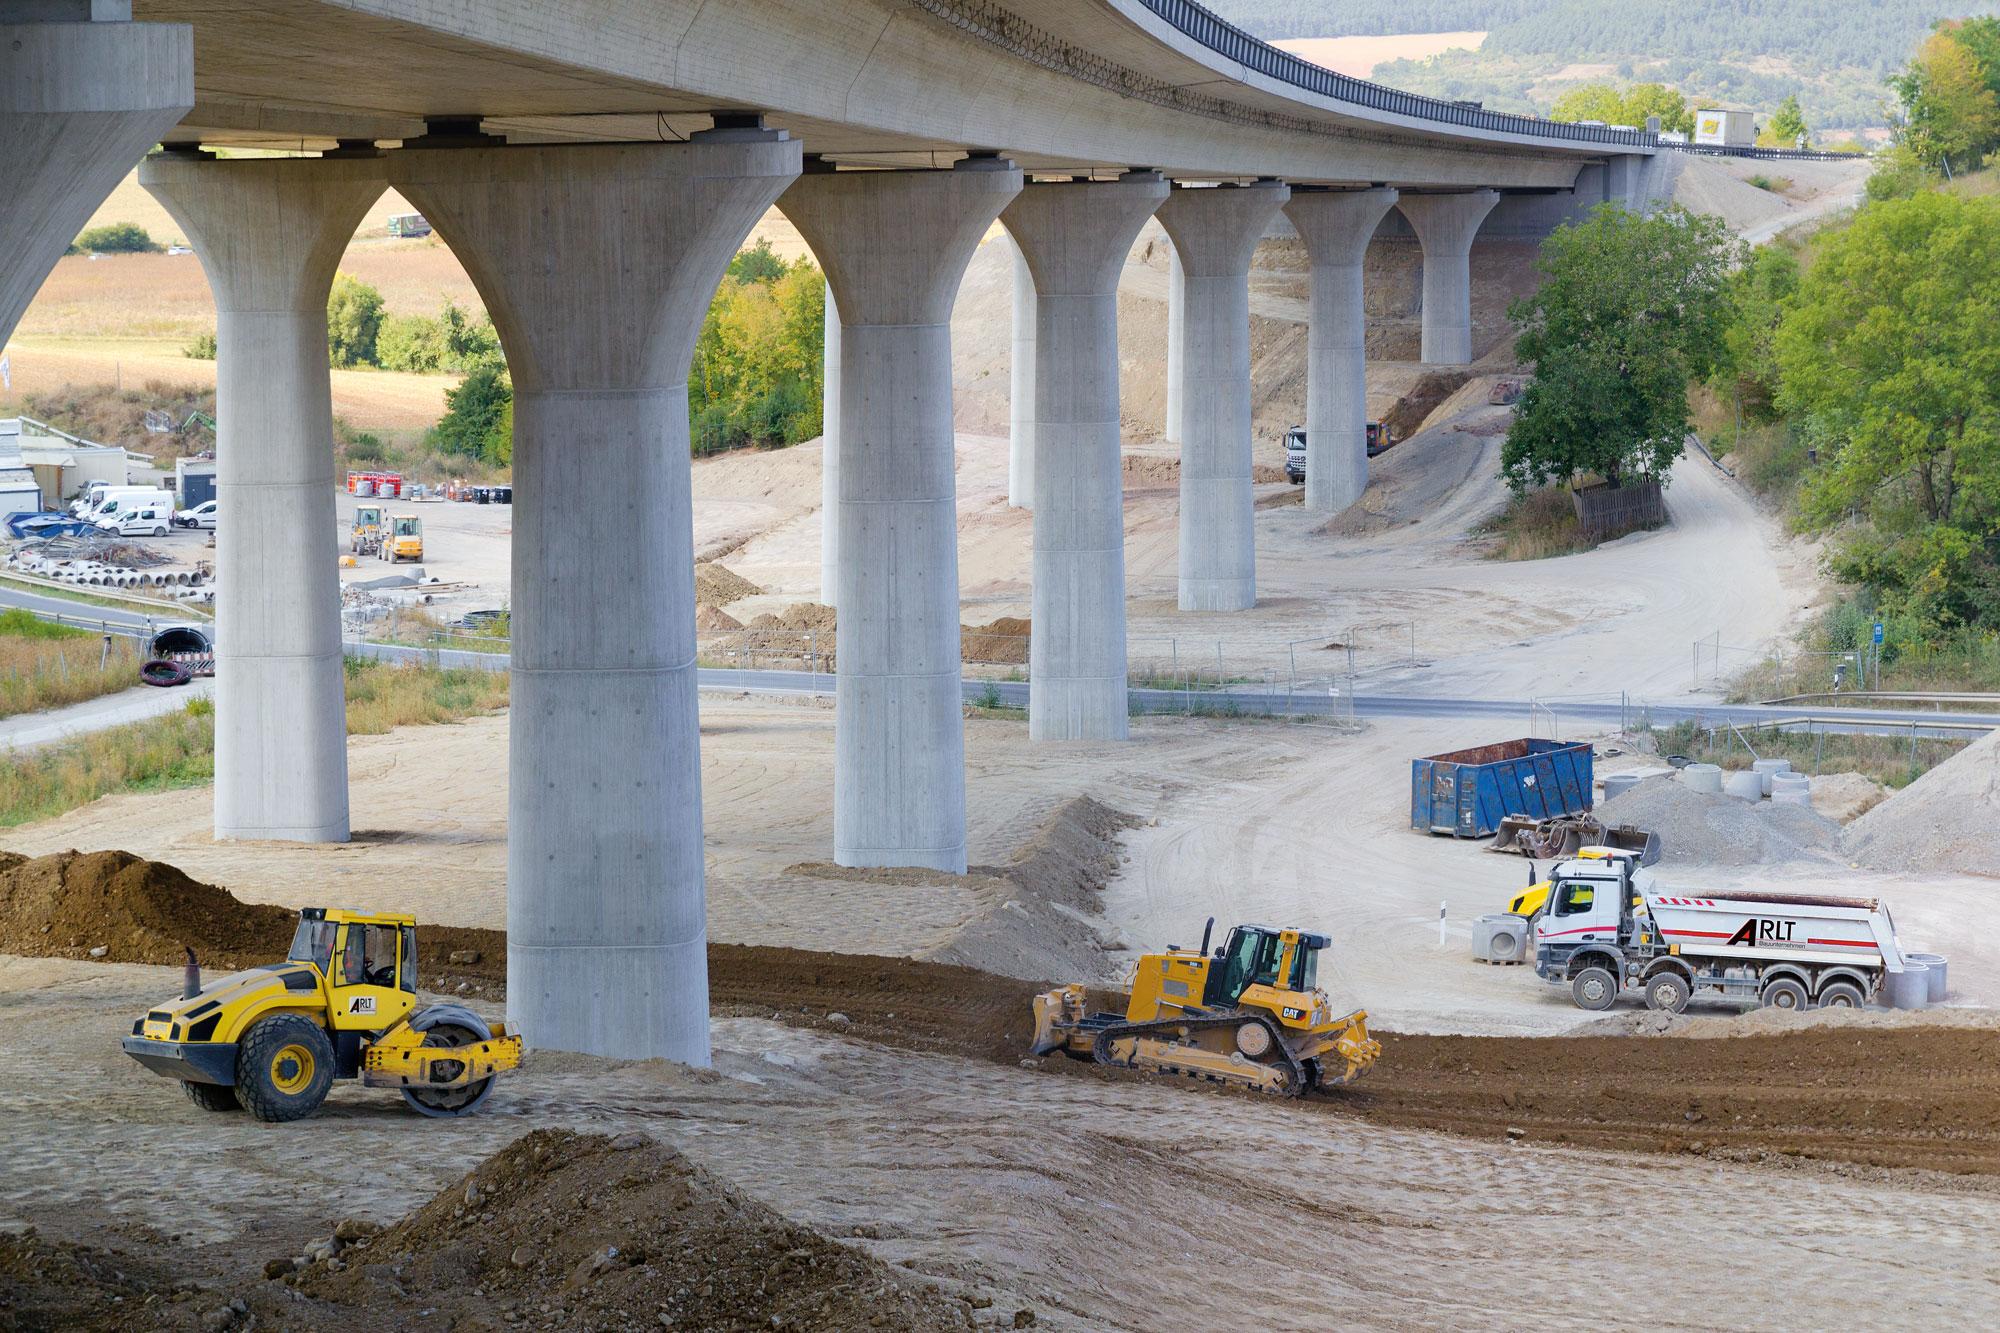 BAB A7 BW622a Talbrücke Klöffelsberg · Geländeprofilierung